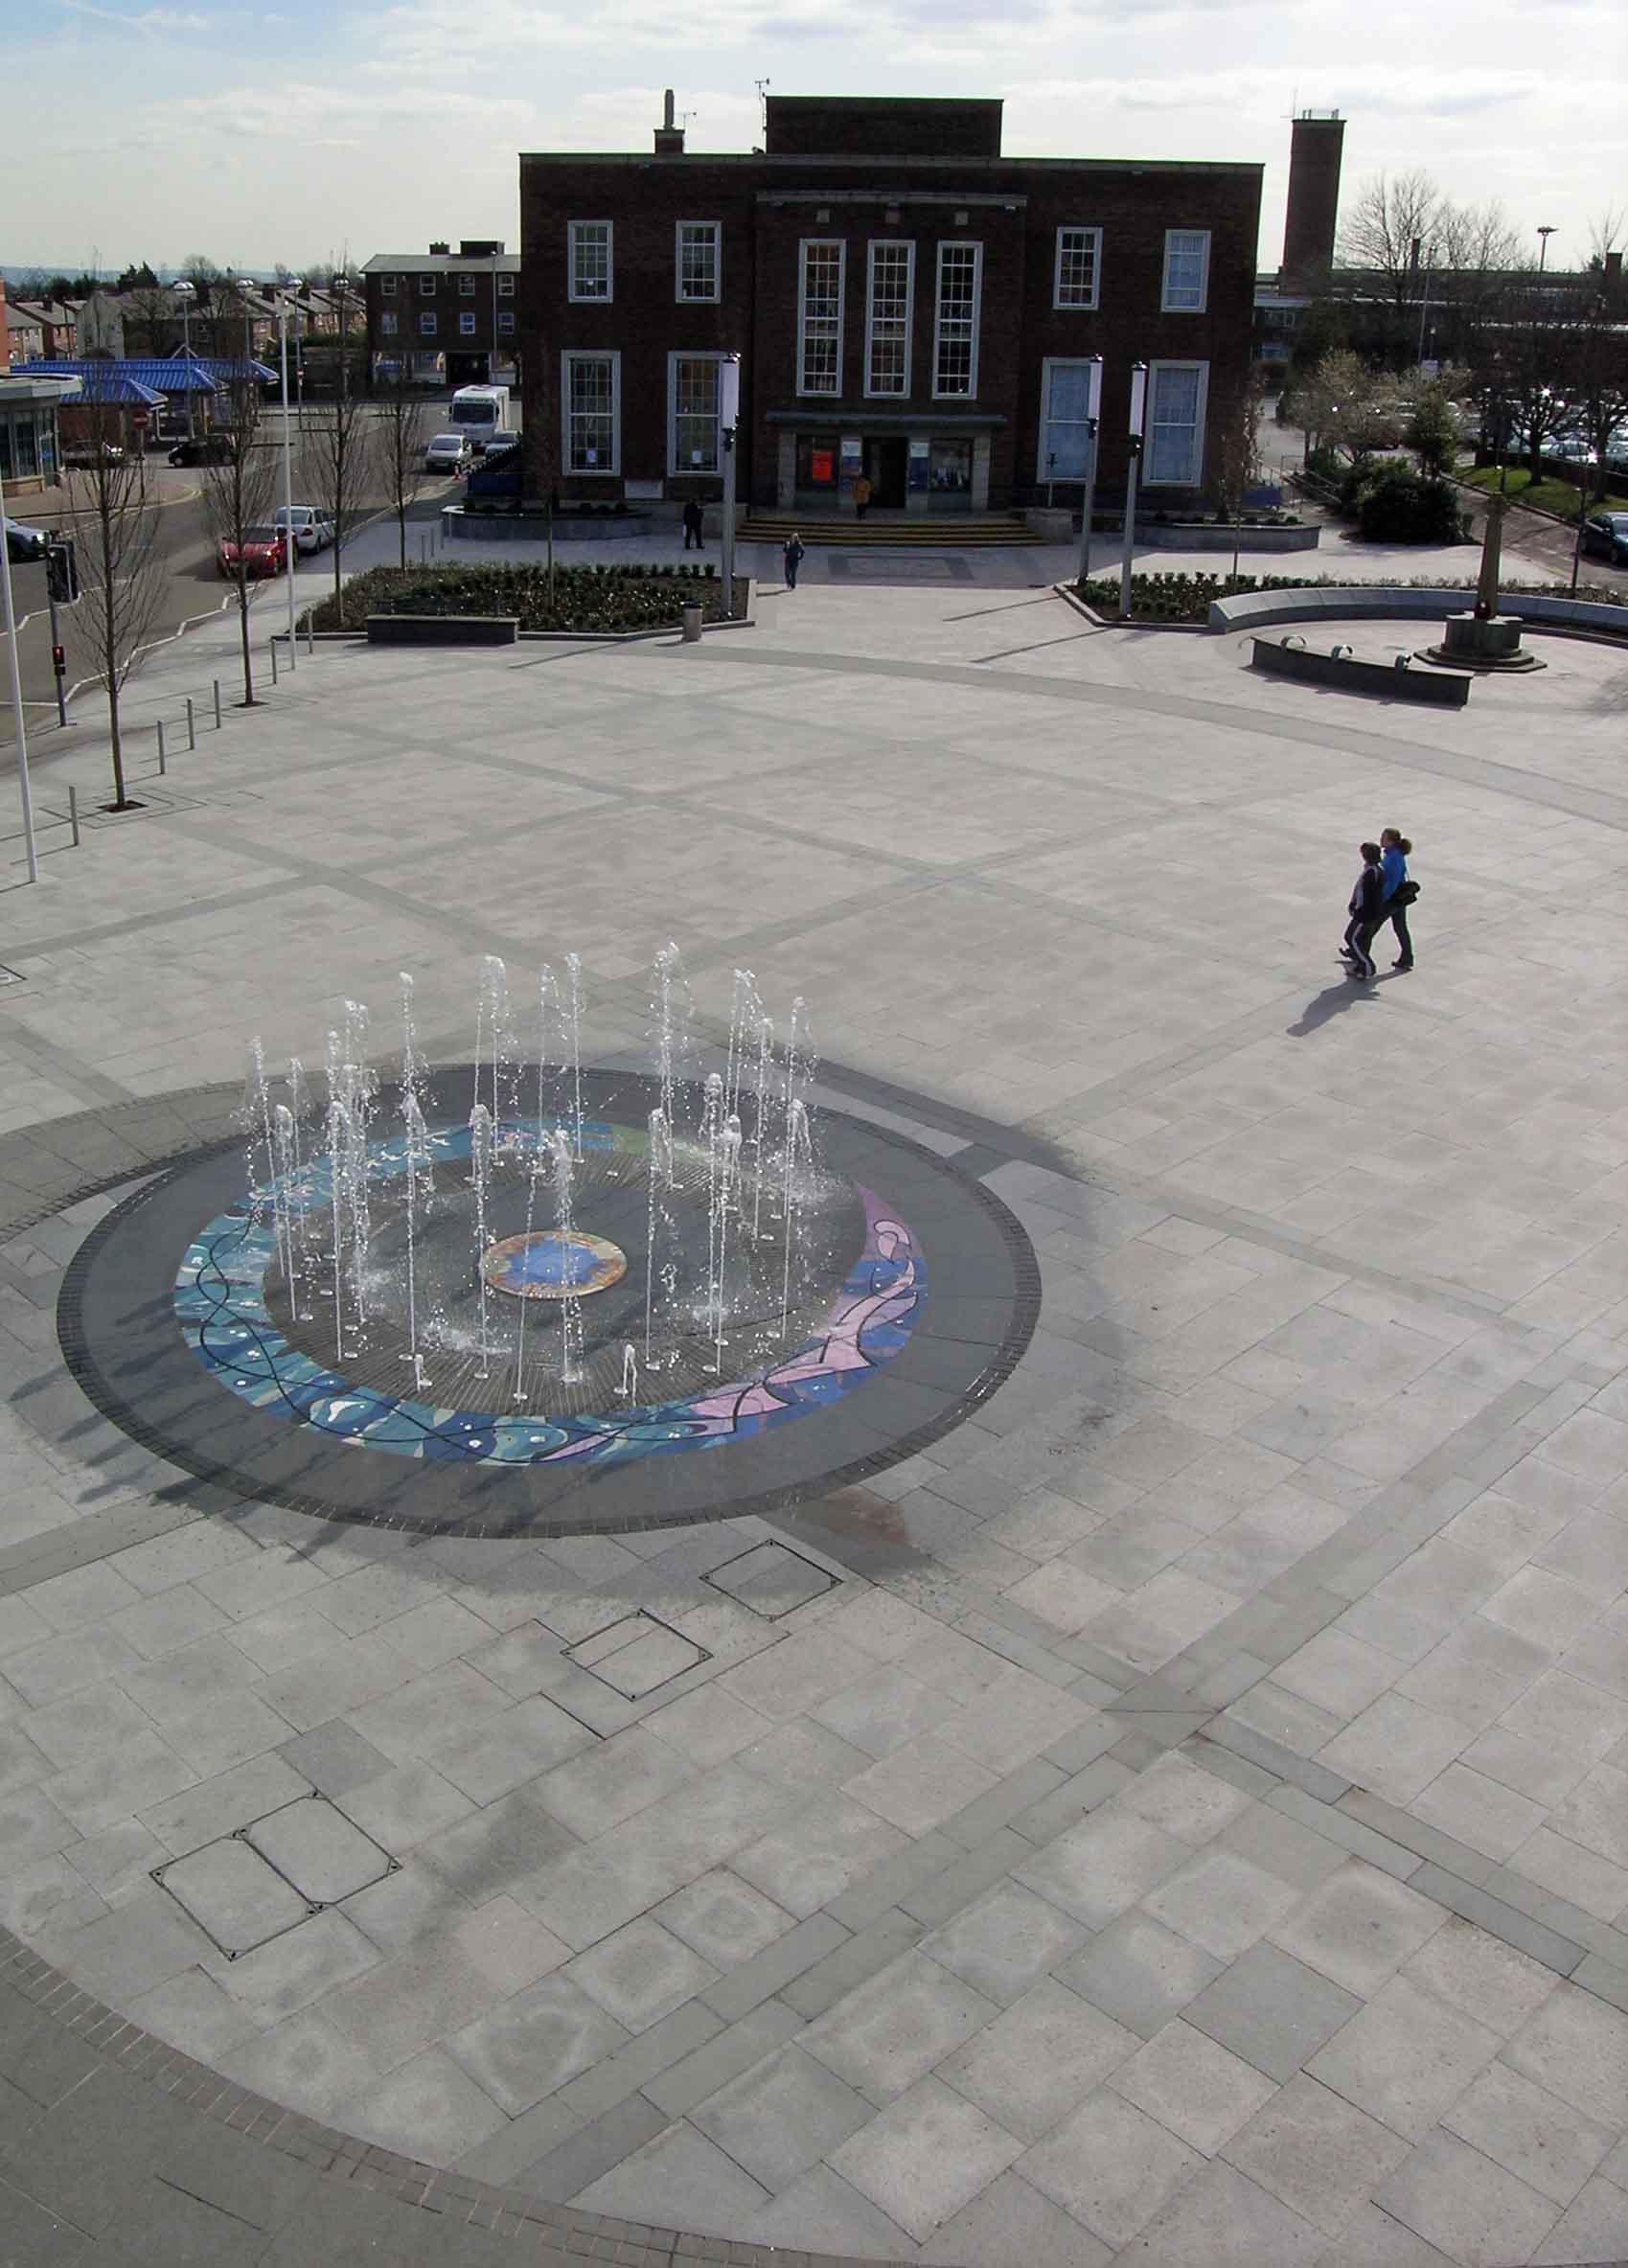 Ellesmere Port Fountain 073 copy.jpg